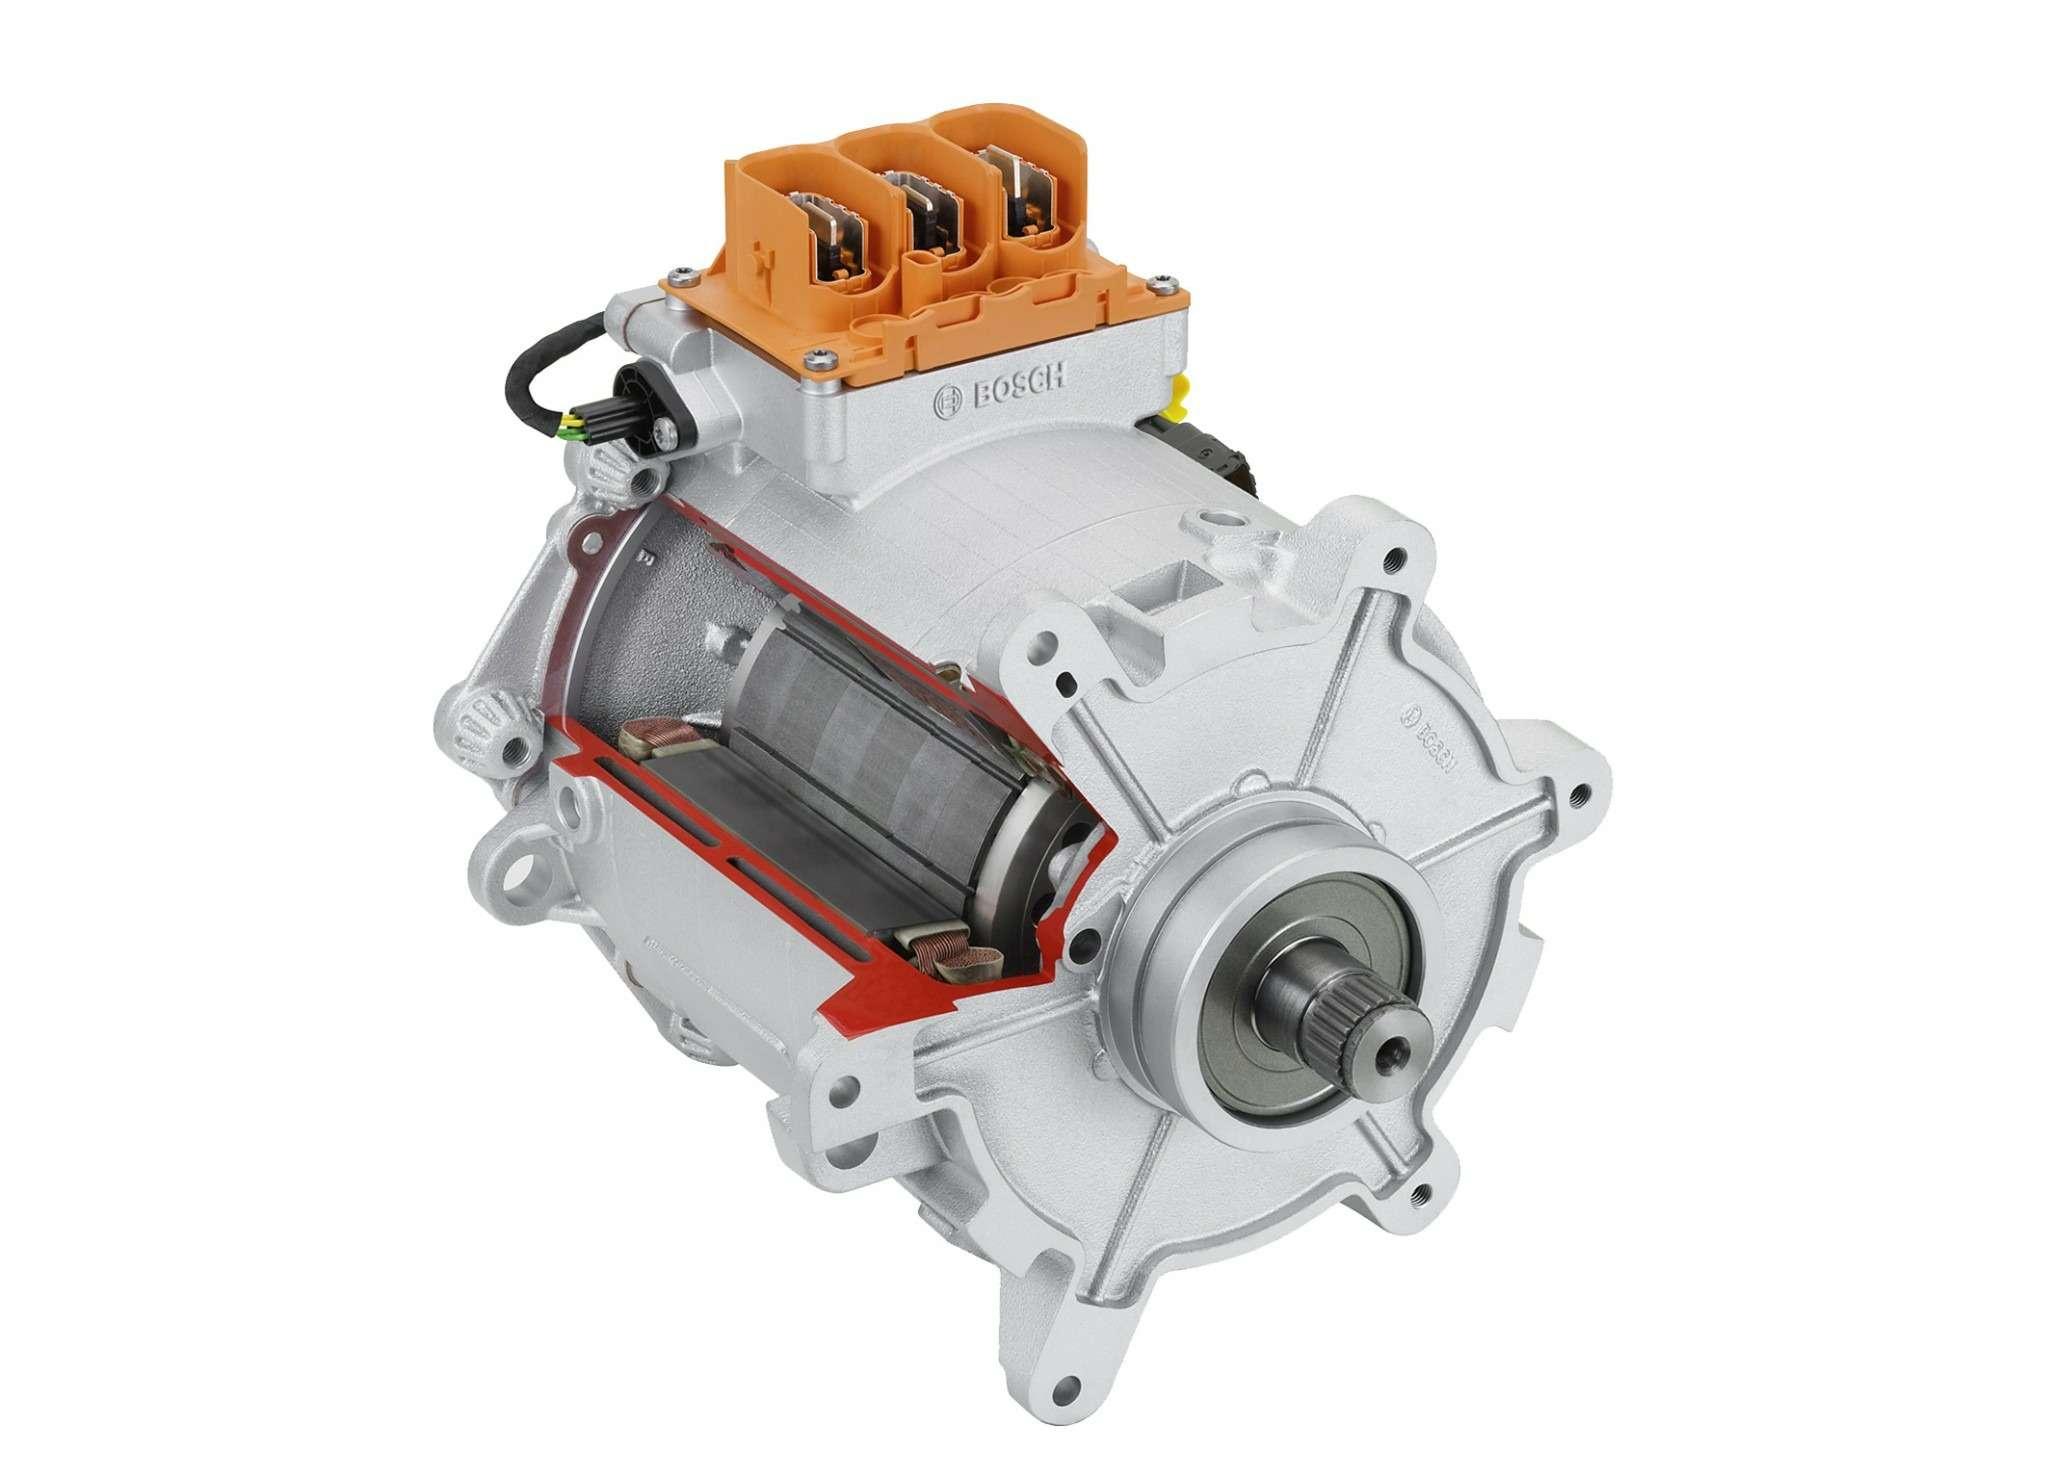 BOSCH electric engine